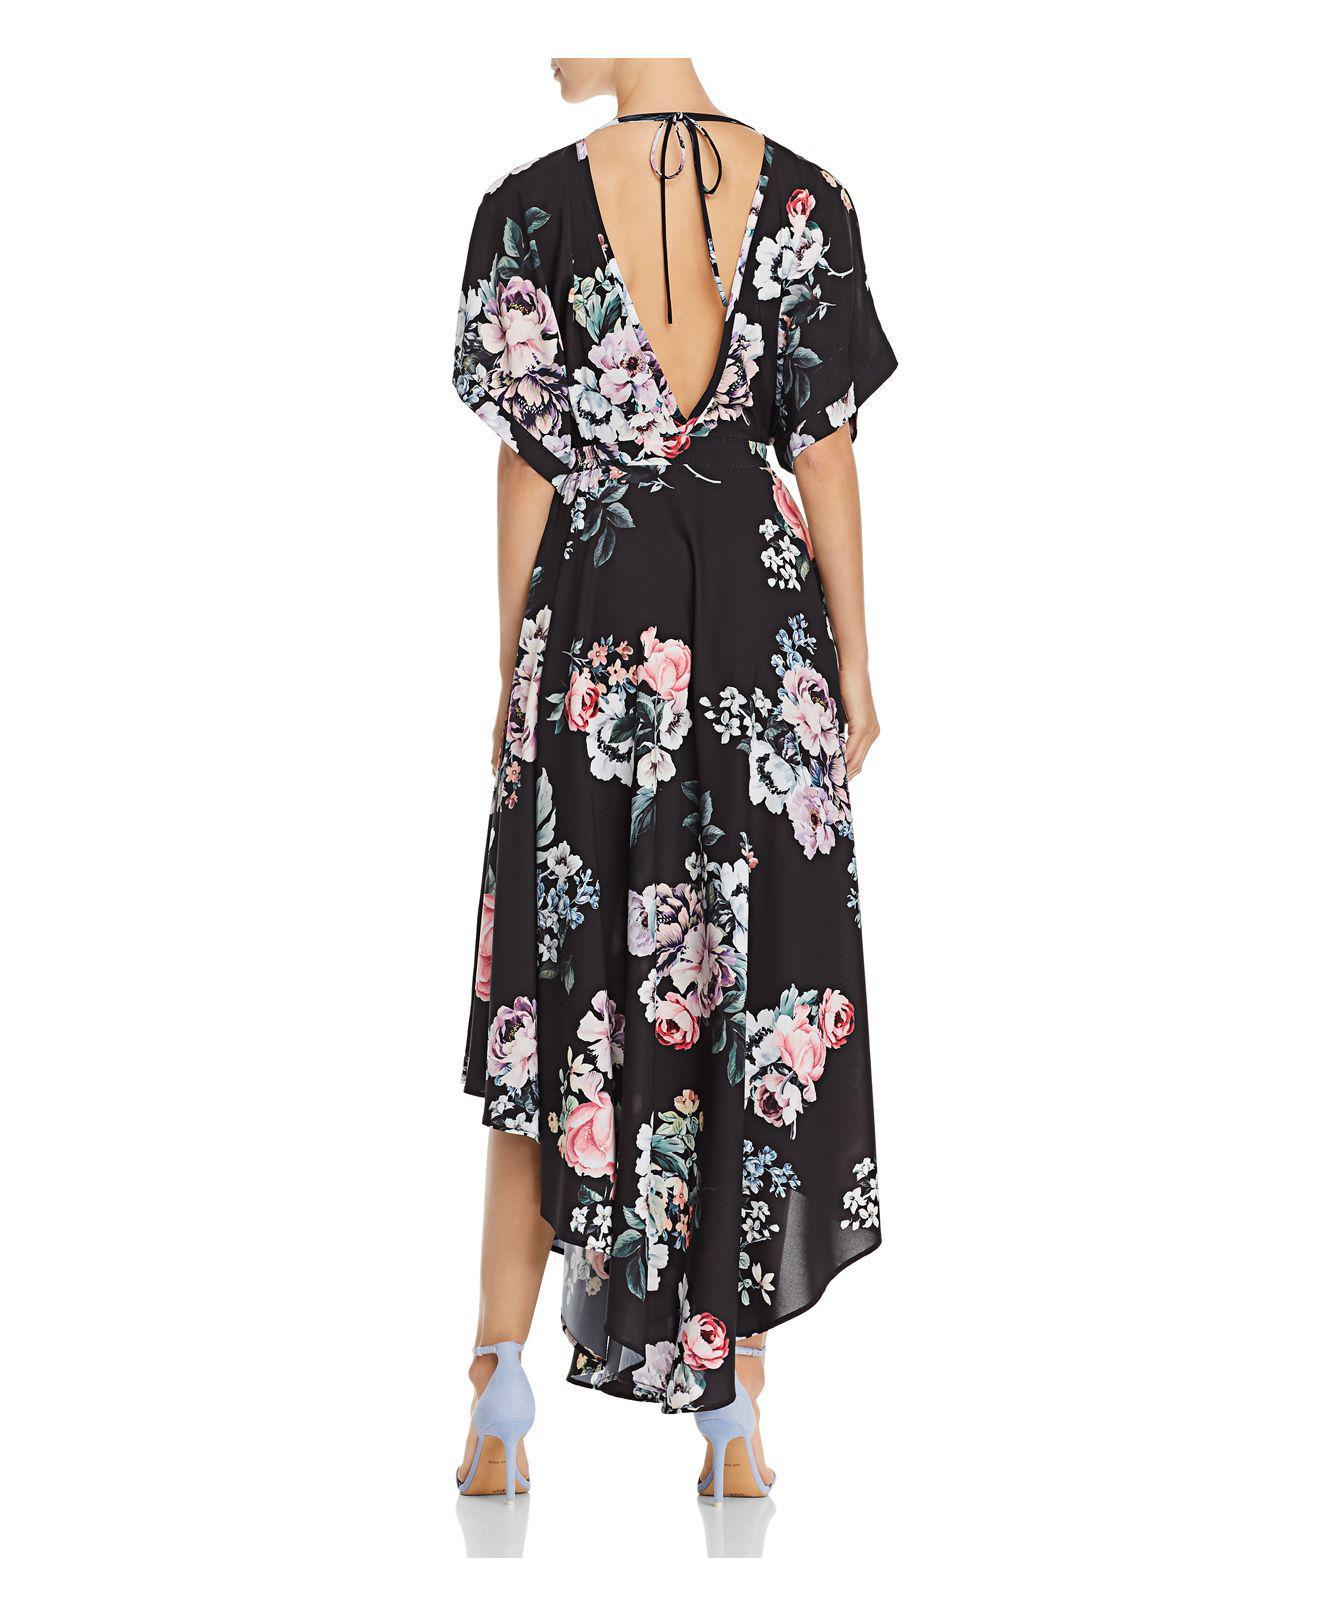 Yumi Kim Dominica Floral-print Dress in Black